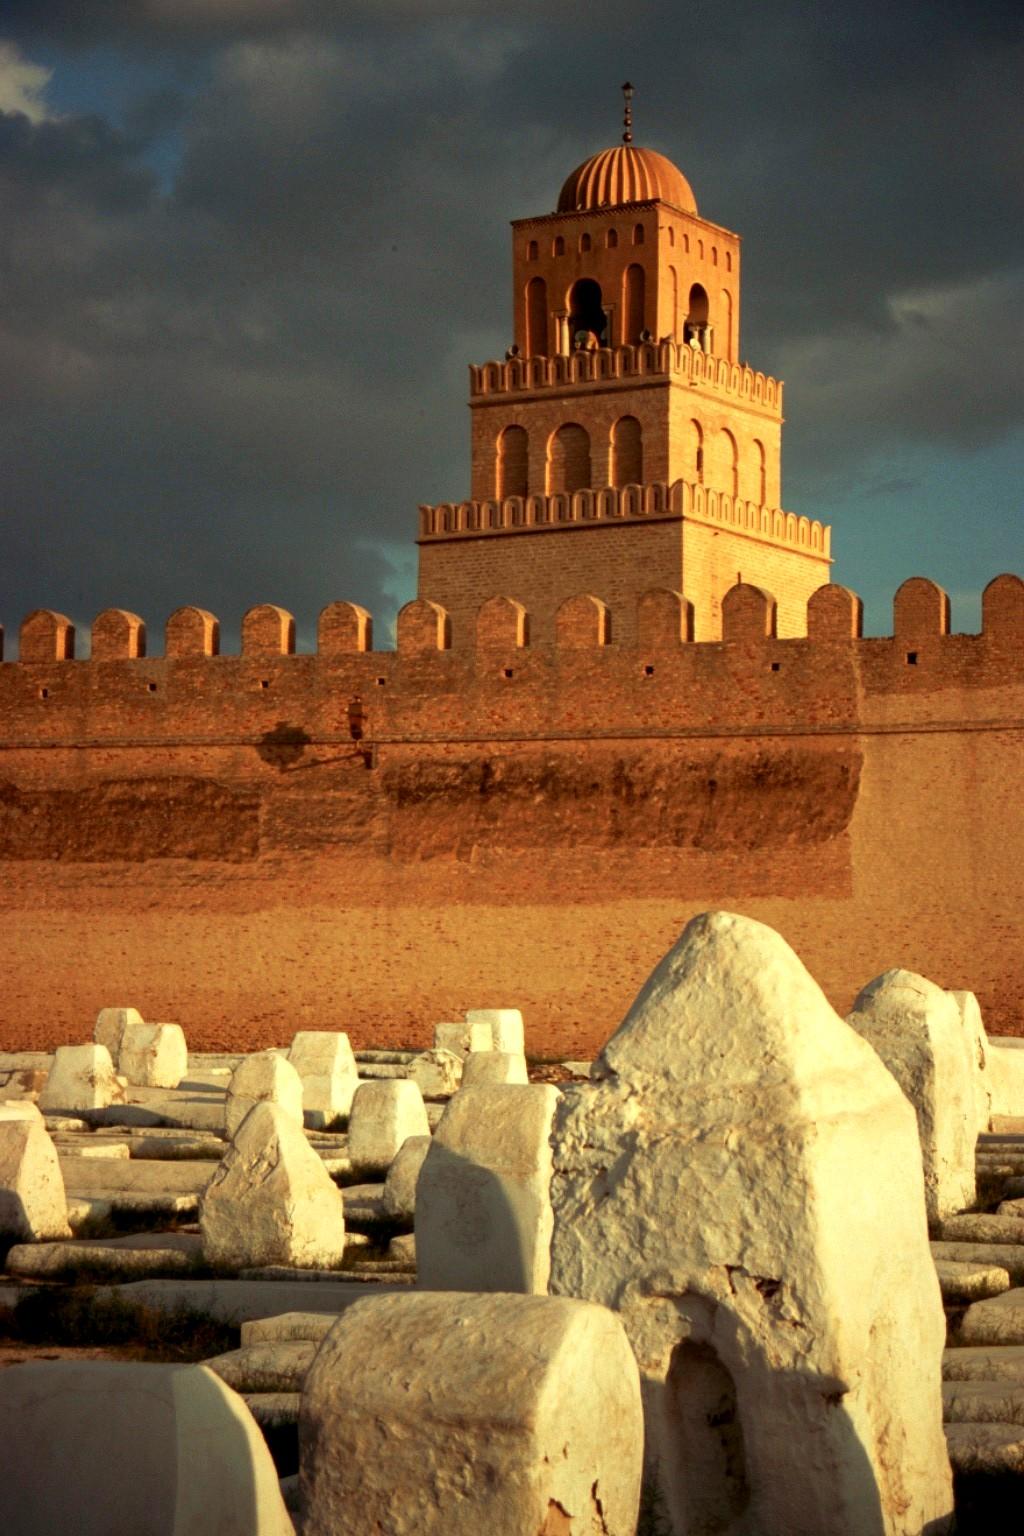 Historia de Túnez